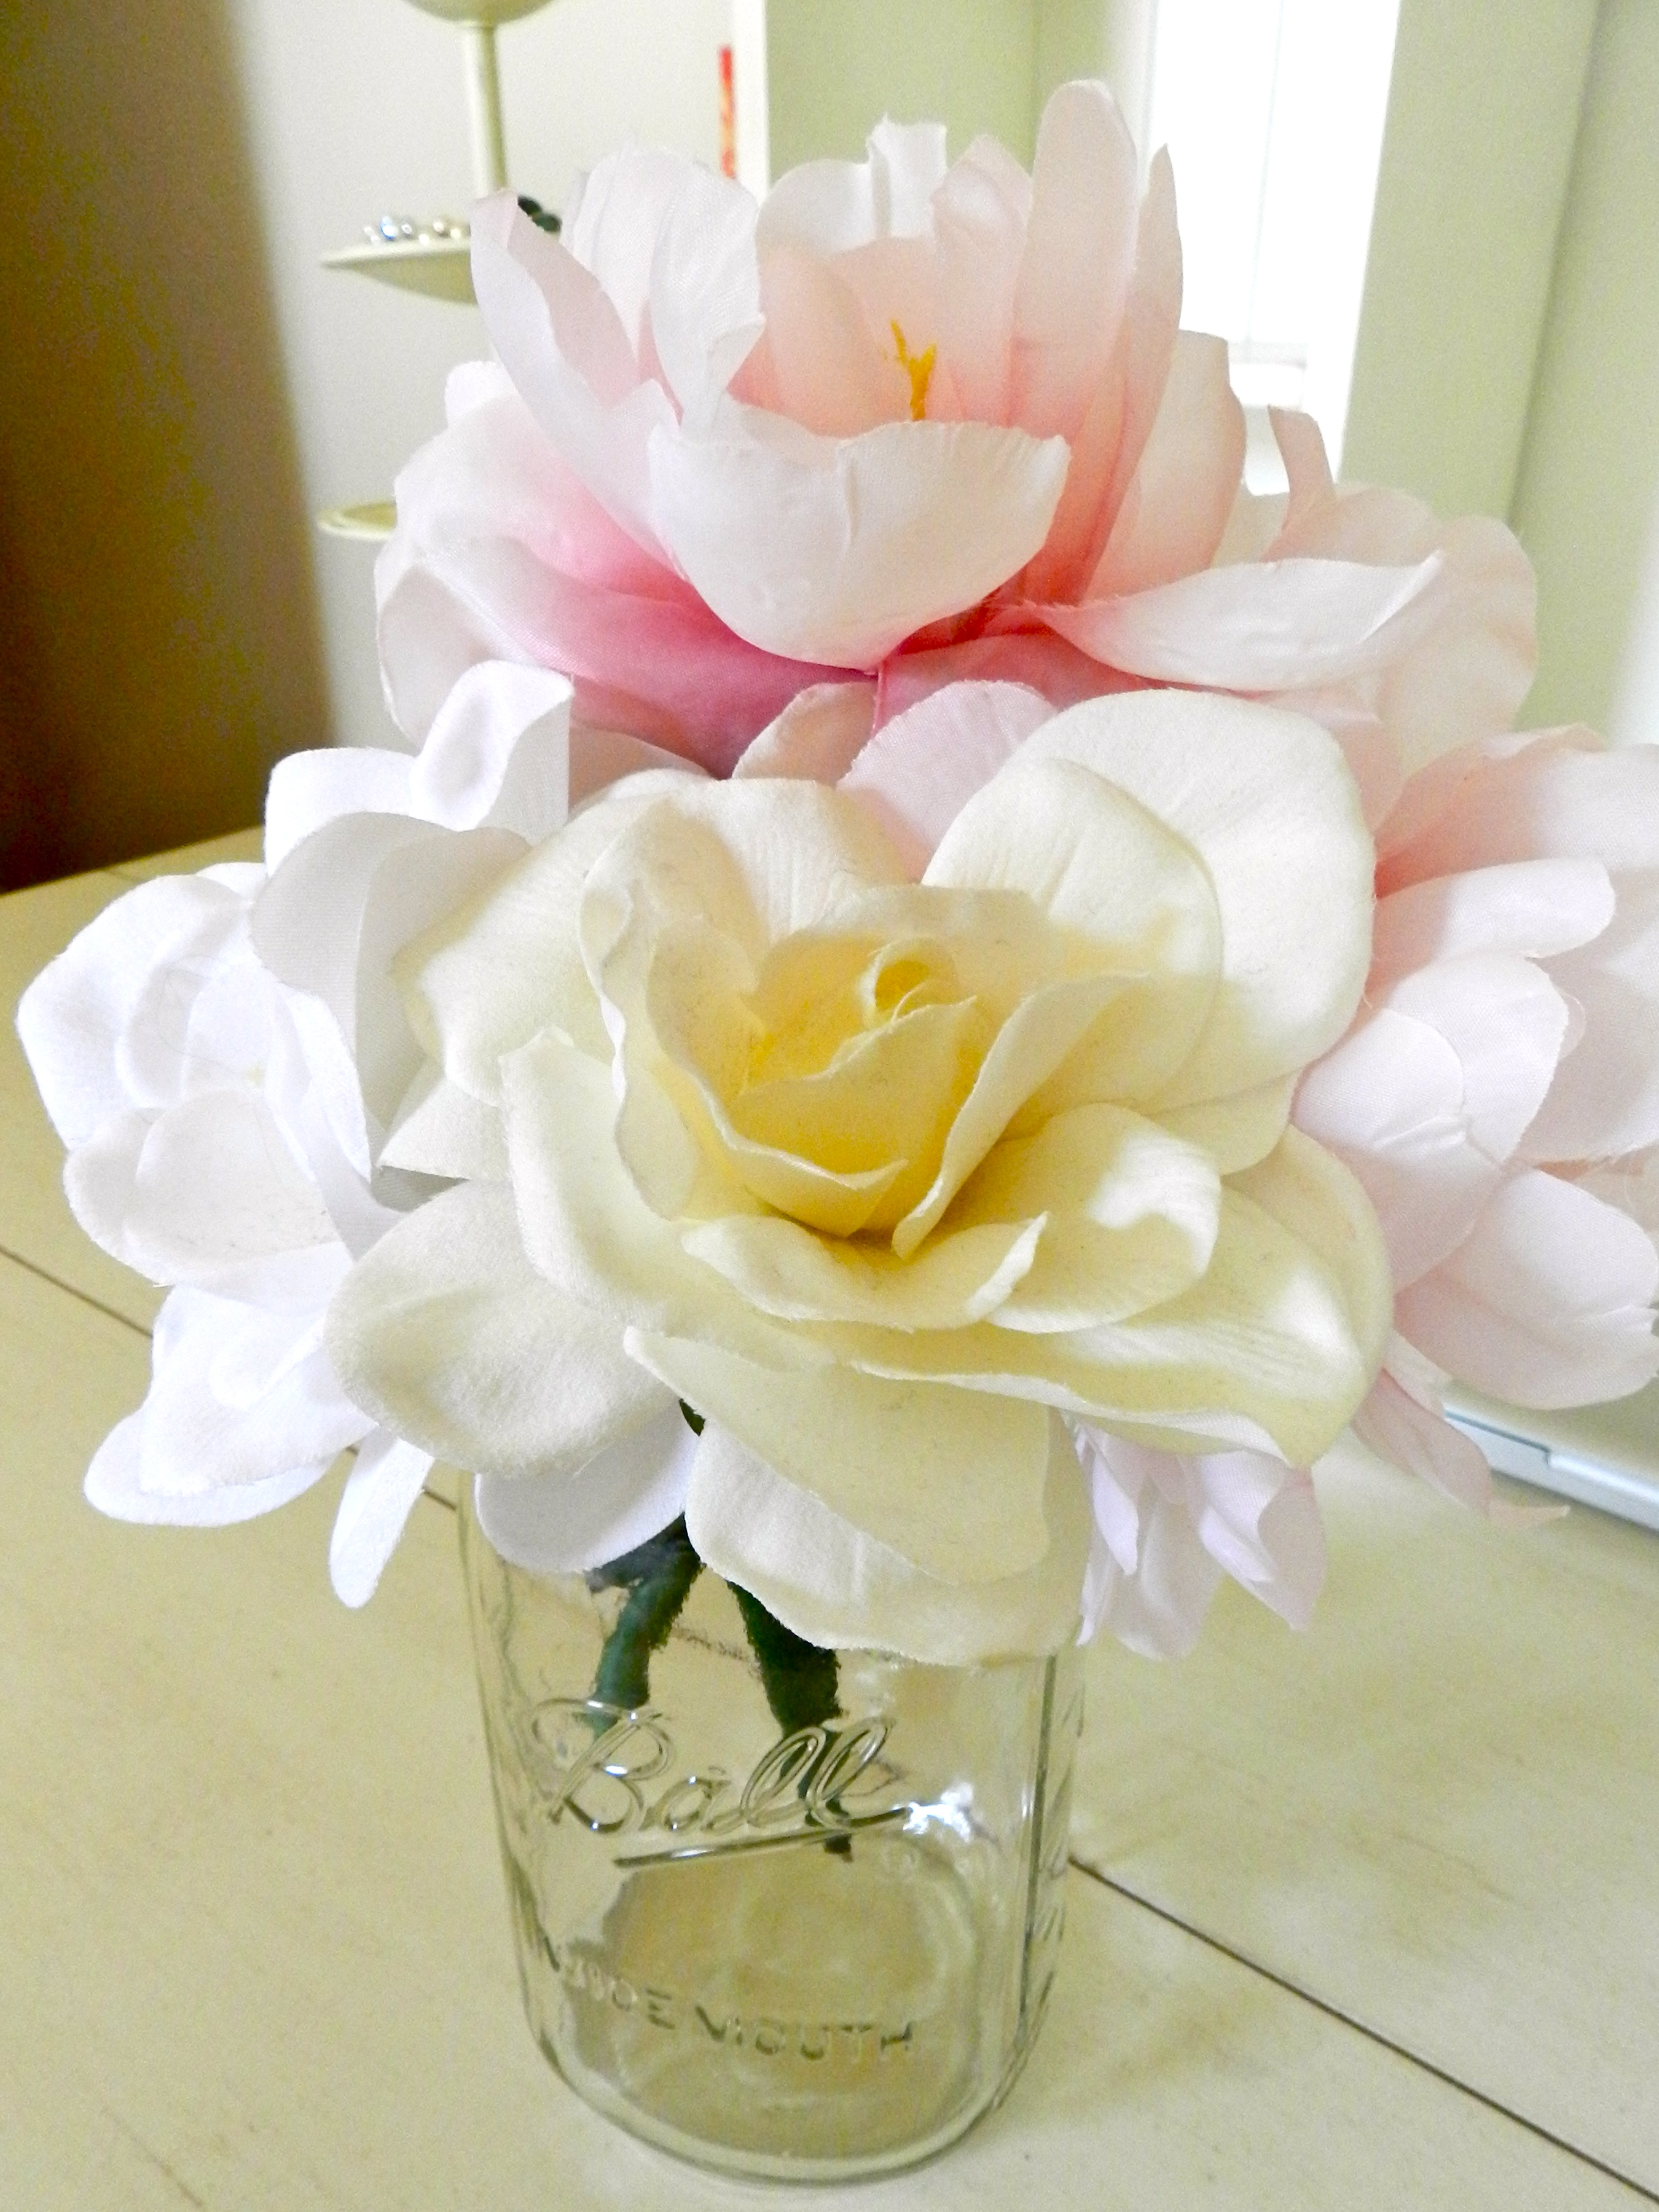 Flower Bouquet Pens | Rachel Schultz